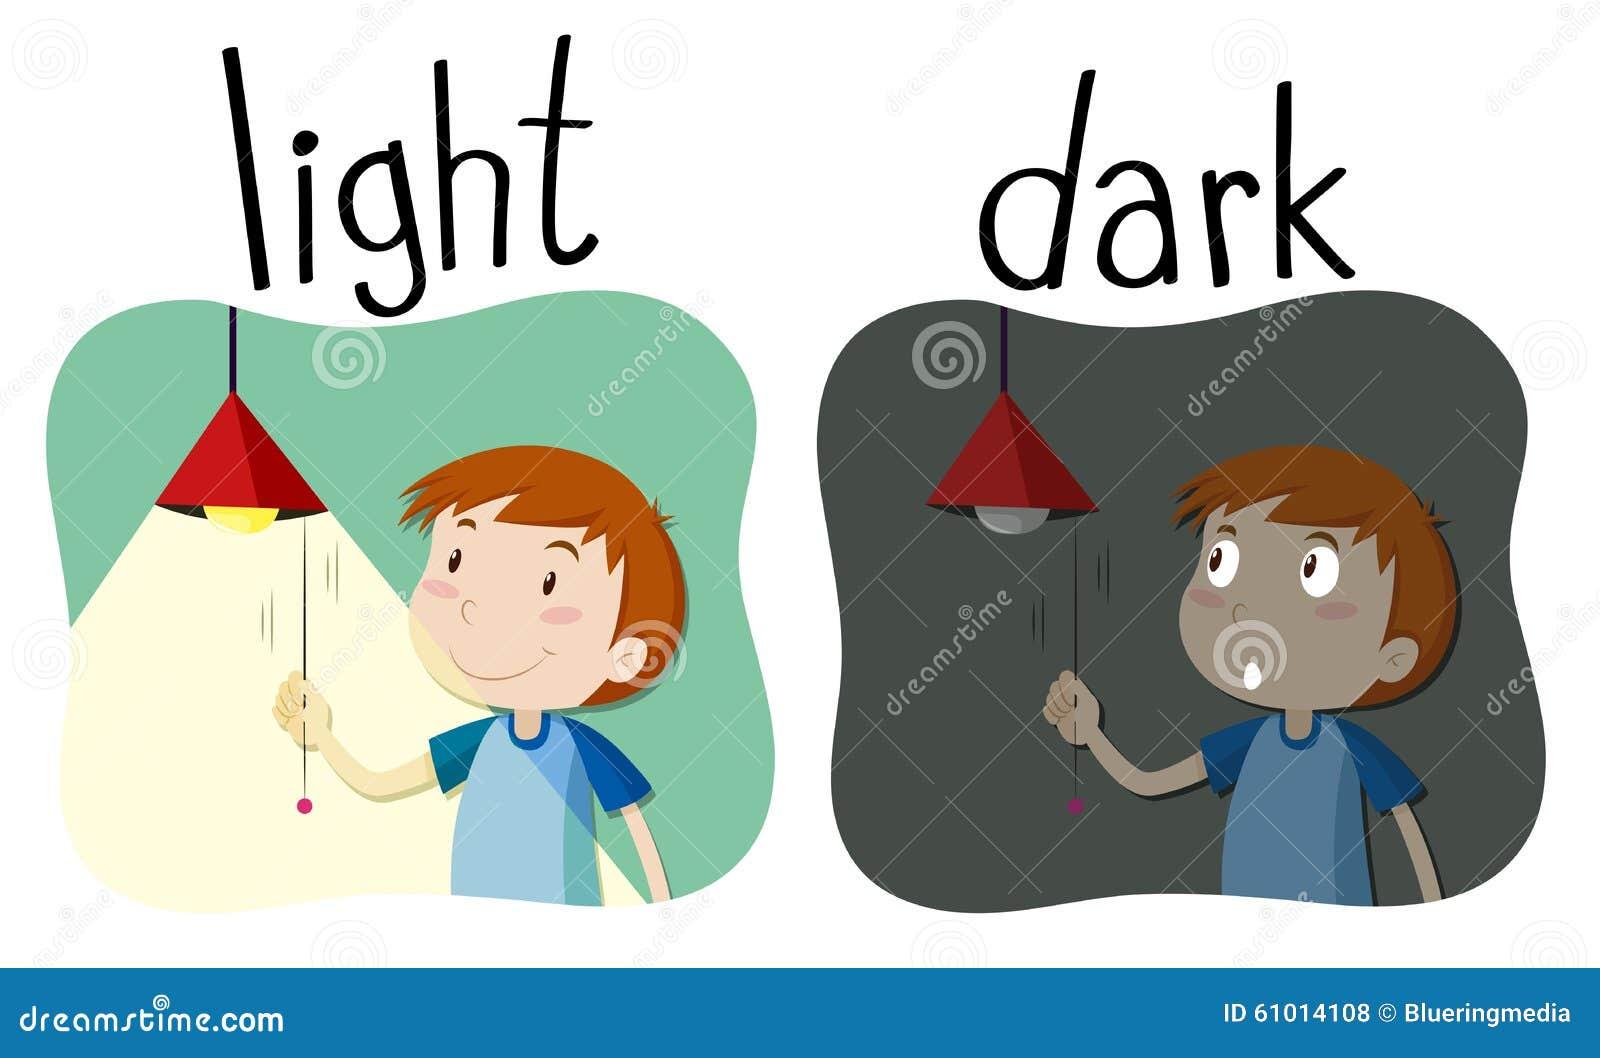 opposite adjectives light and dark stock illustration clipart ringworm clipart ring image